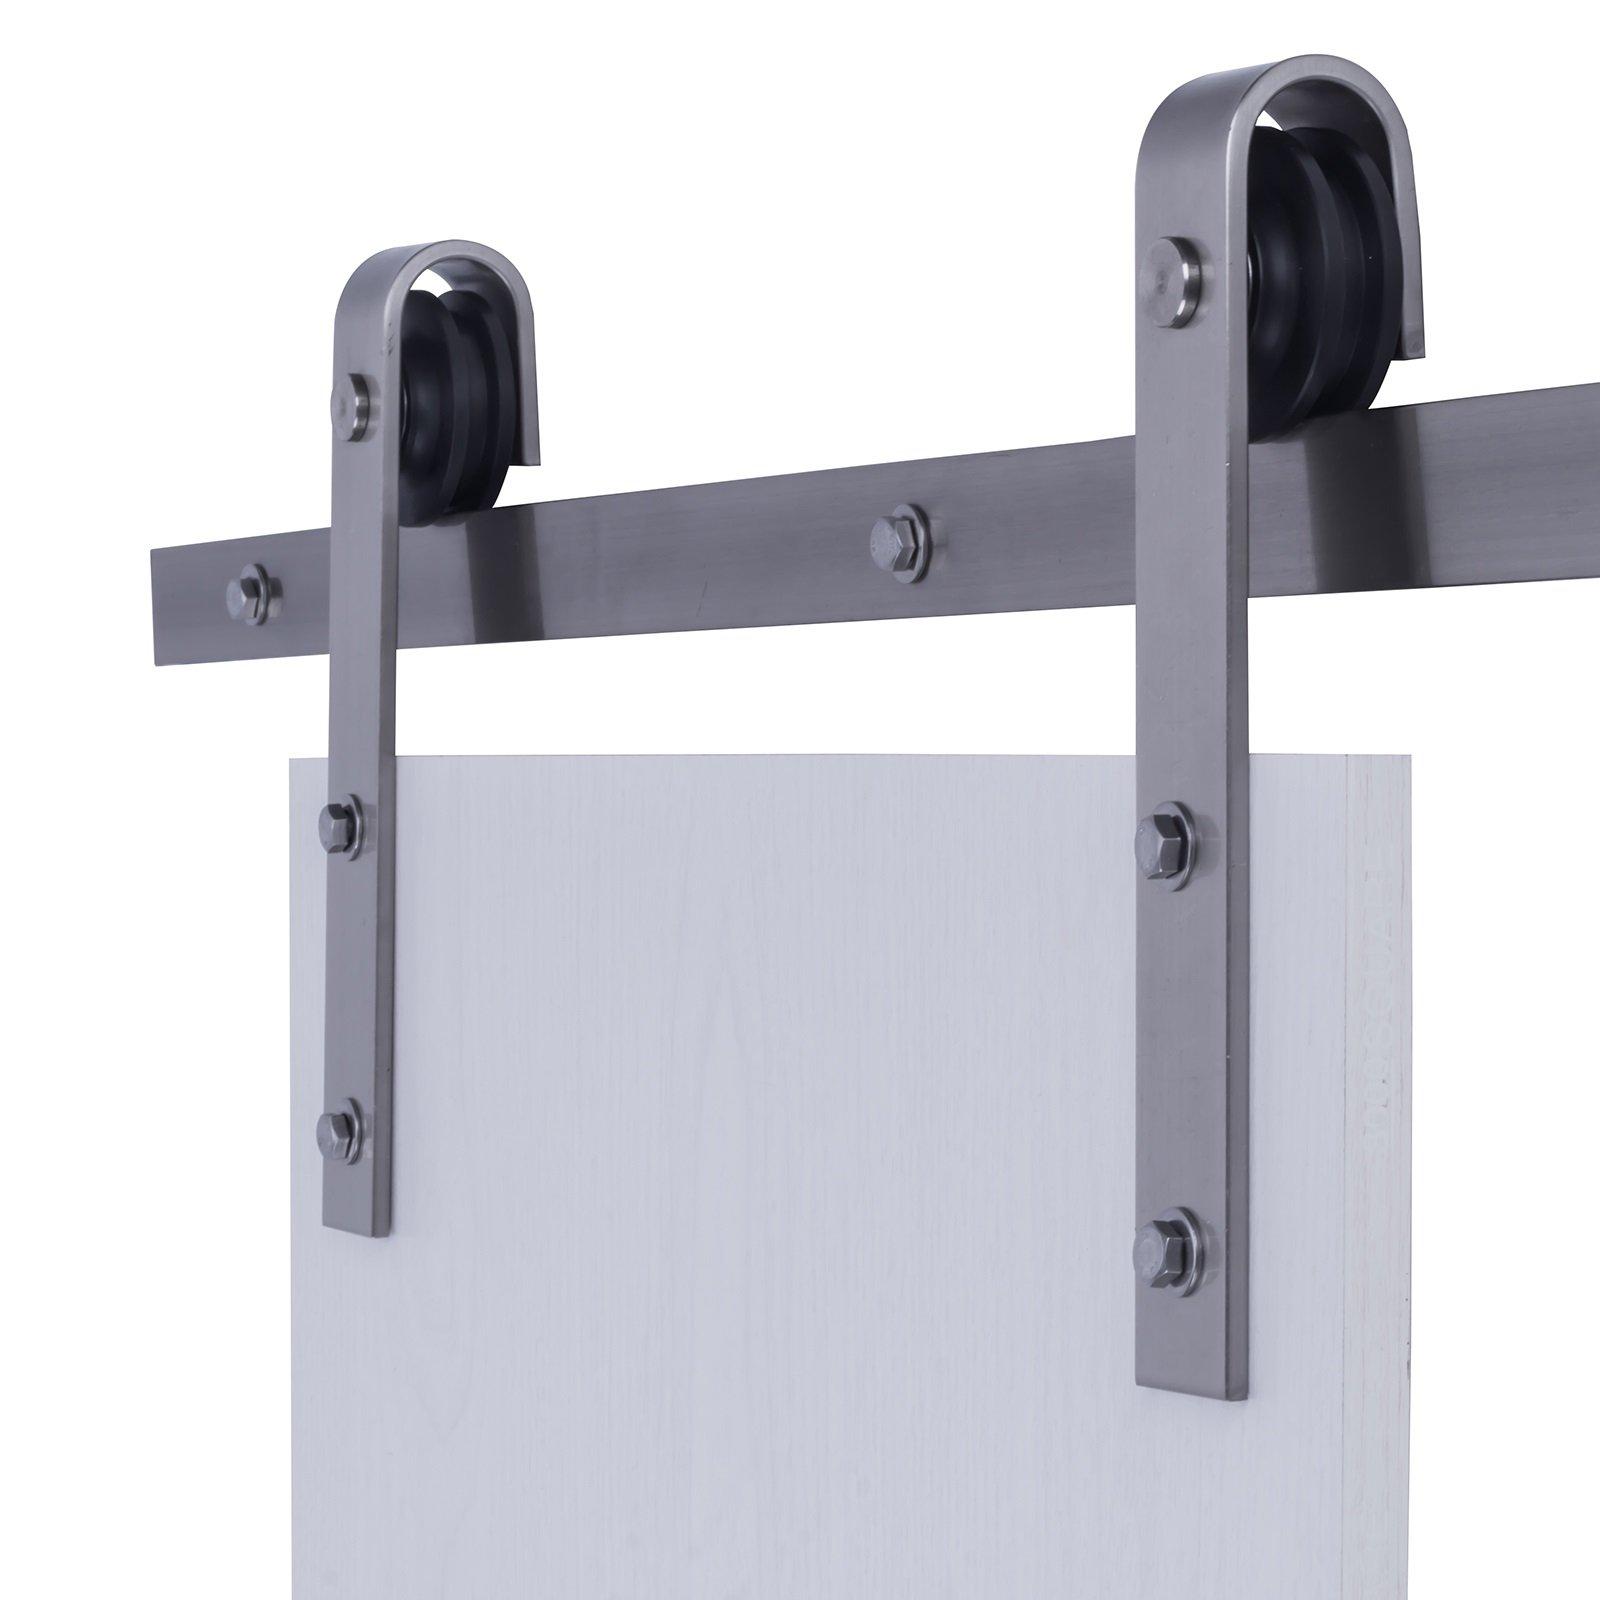 6.6 FT J Shaped Industrial Sliding Barn Door Track Rail Sliding Track Hardware Kit Country Style Barn Wood Door Basic Sliding Silver Steel Track Hardware Kit (6.6ft Silver Color)